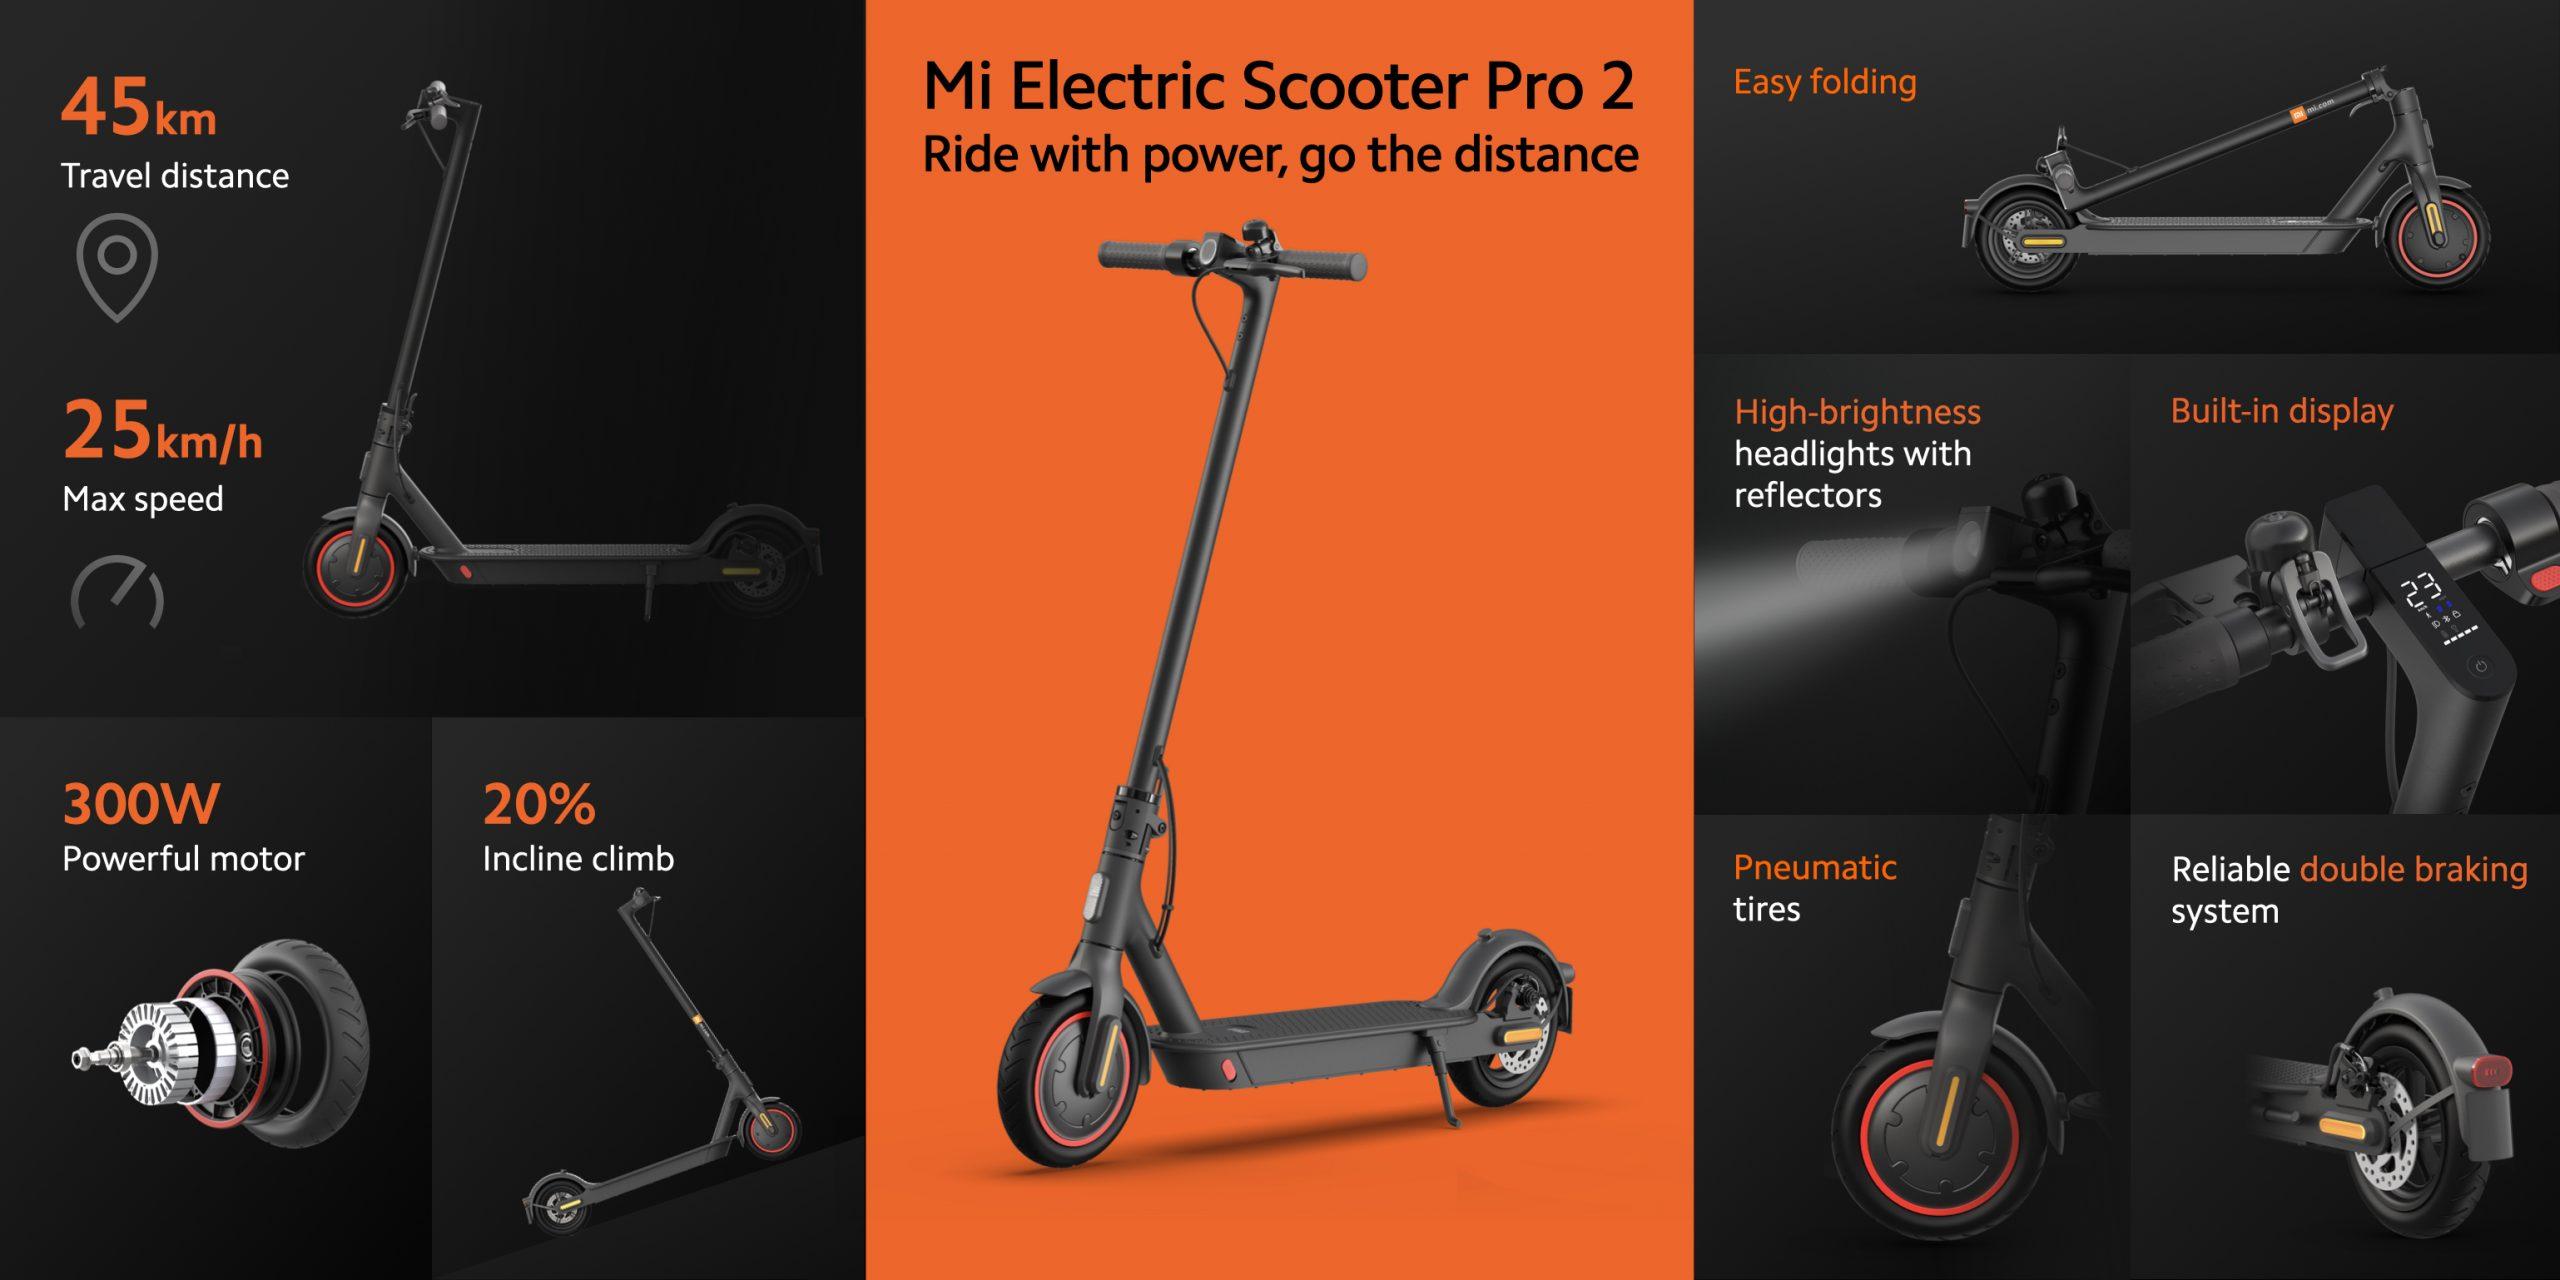 Xiaomi Mi Electric Scooter 1s And Mi Electric Scooter Pro 2 Two Electric Scooters With Certain Improvements Xiaomist